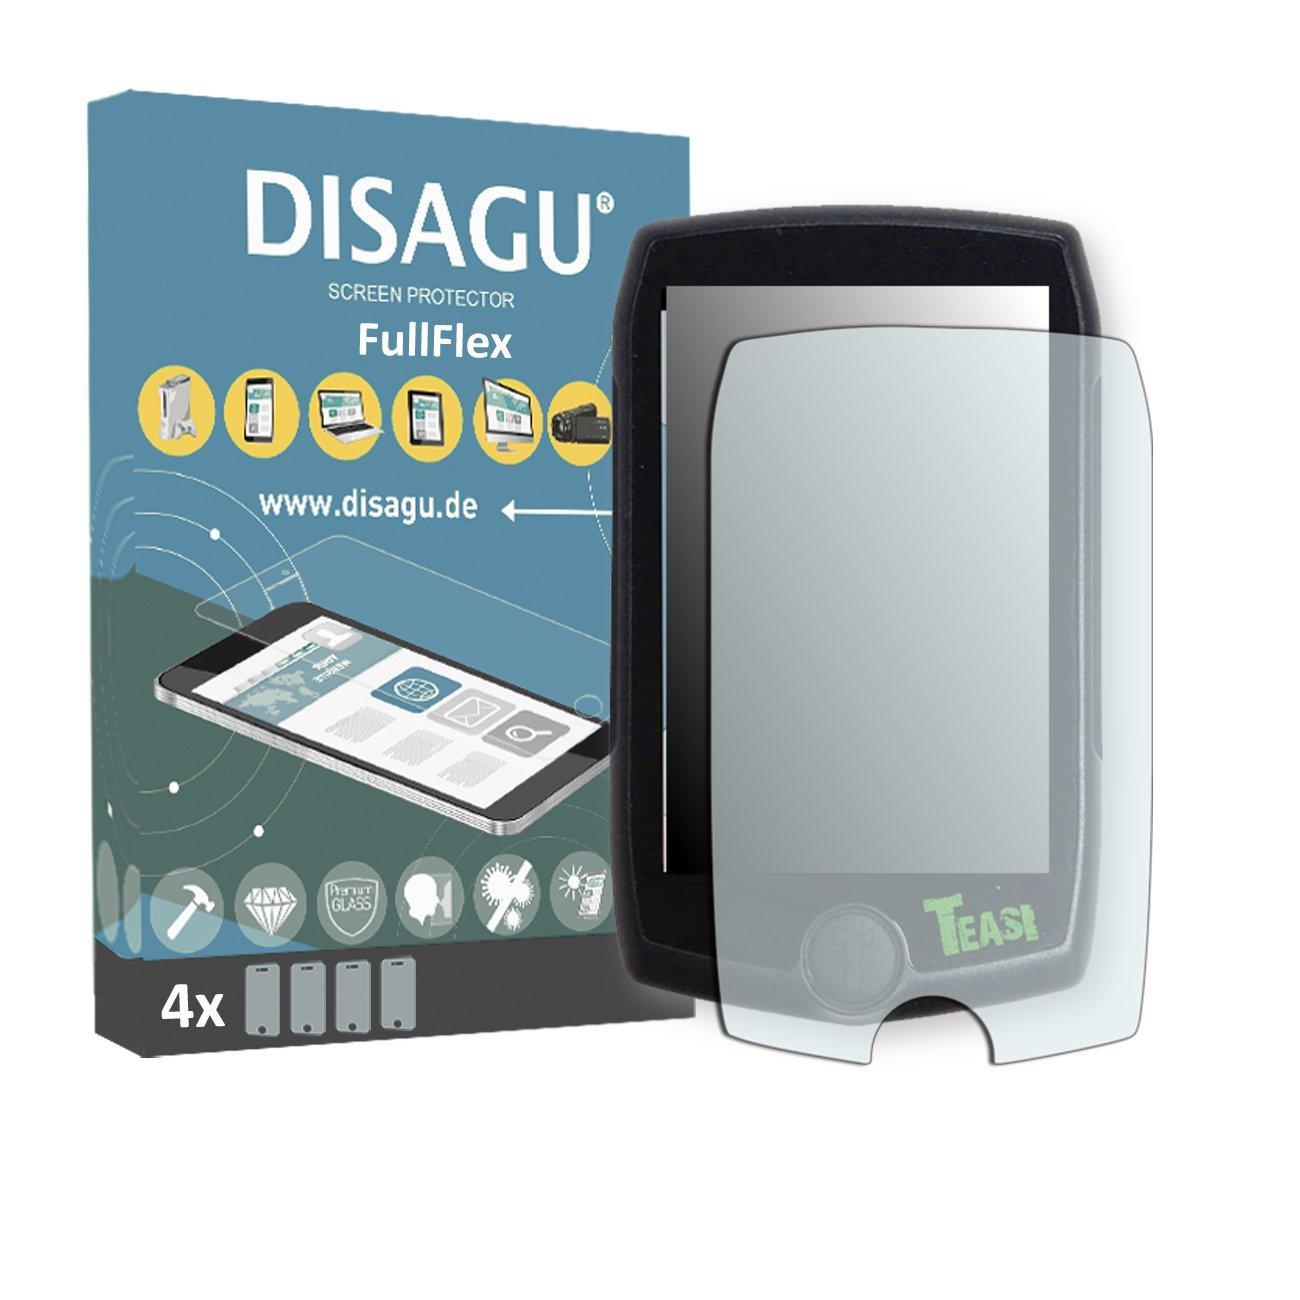 4 x Disagu FullFlex screen protector for Teasi Pro foil screen protector